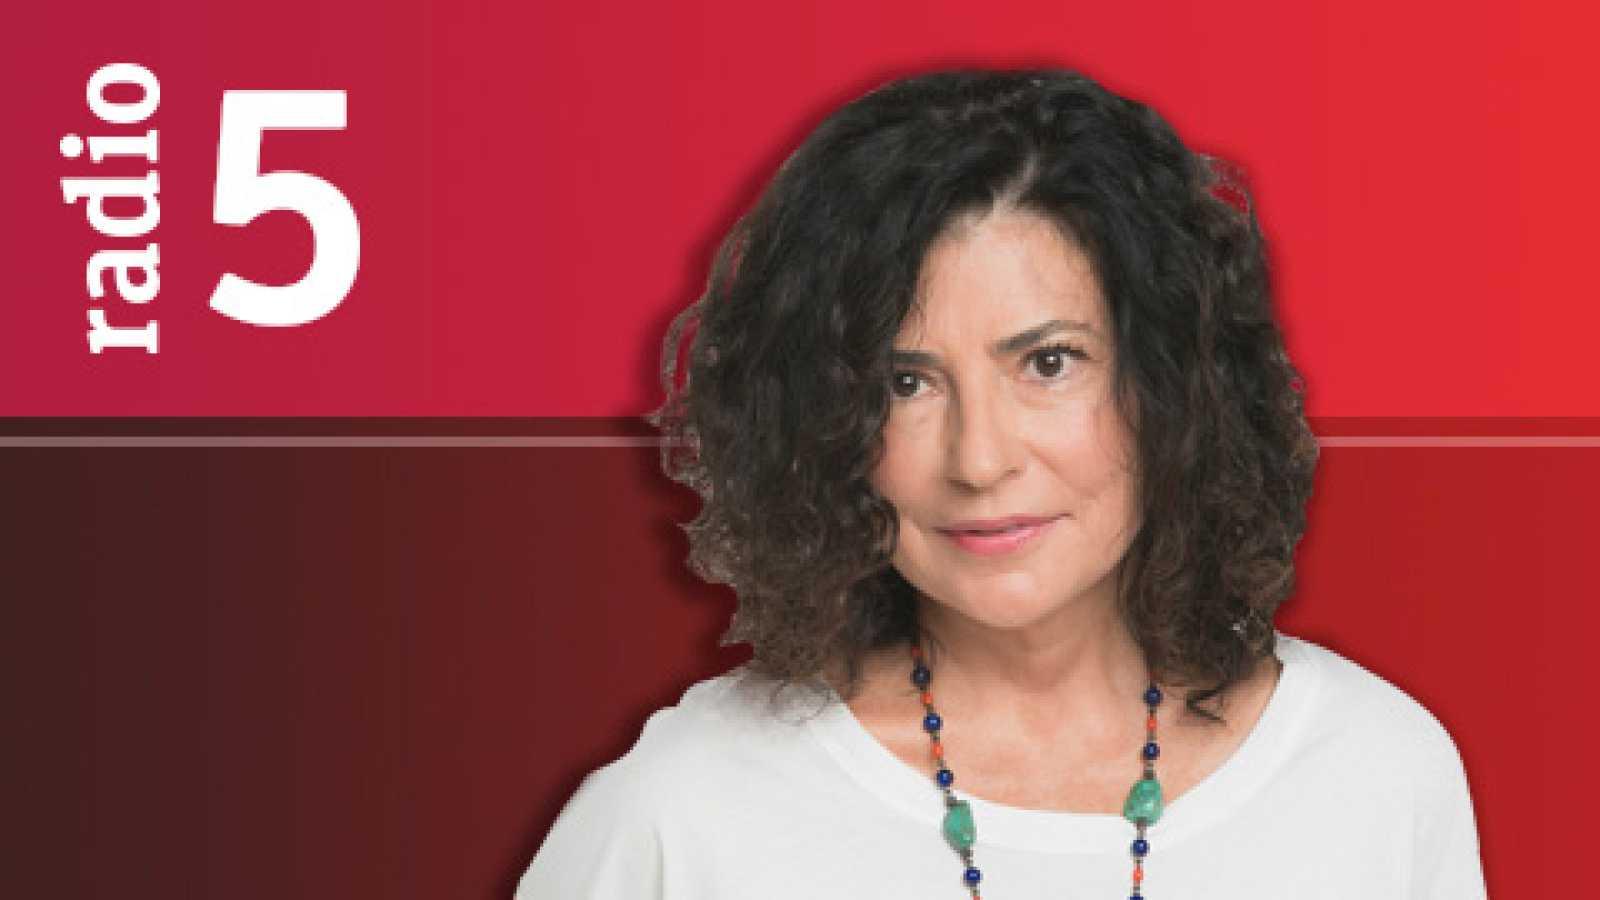 Mujeres Malditas - Gabriela Mistral - 29/10/13 - escuchar ahora